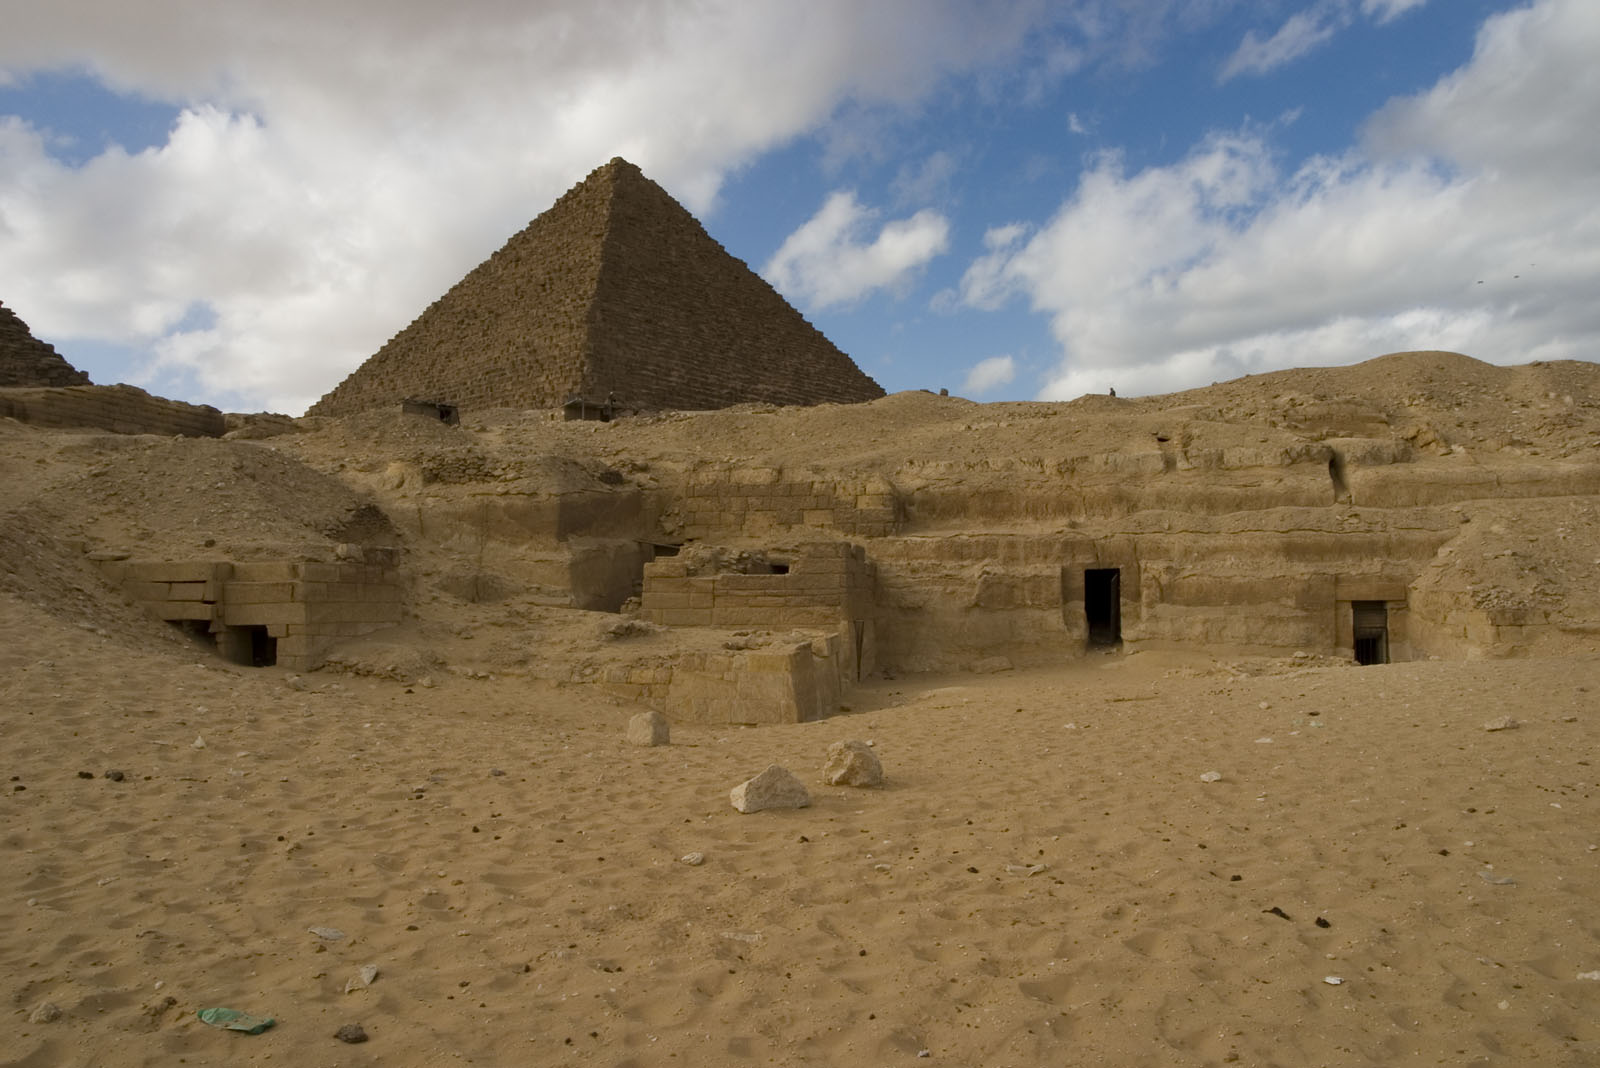 Menkaure quarry cemetery: Site: Giza; View: MQ 134, MQ 120, MQ 124, MQ 121, MQ 130